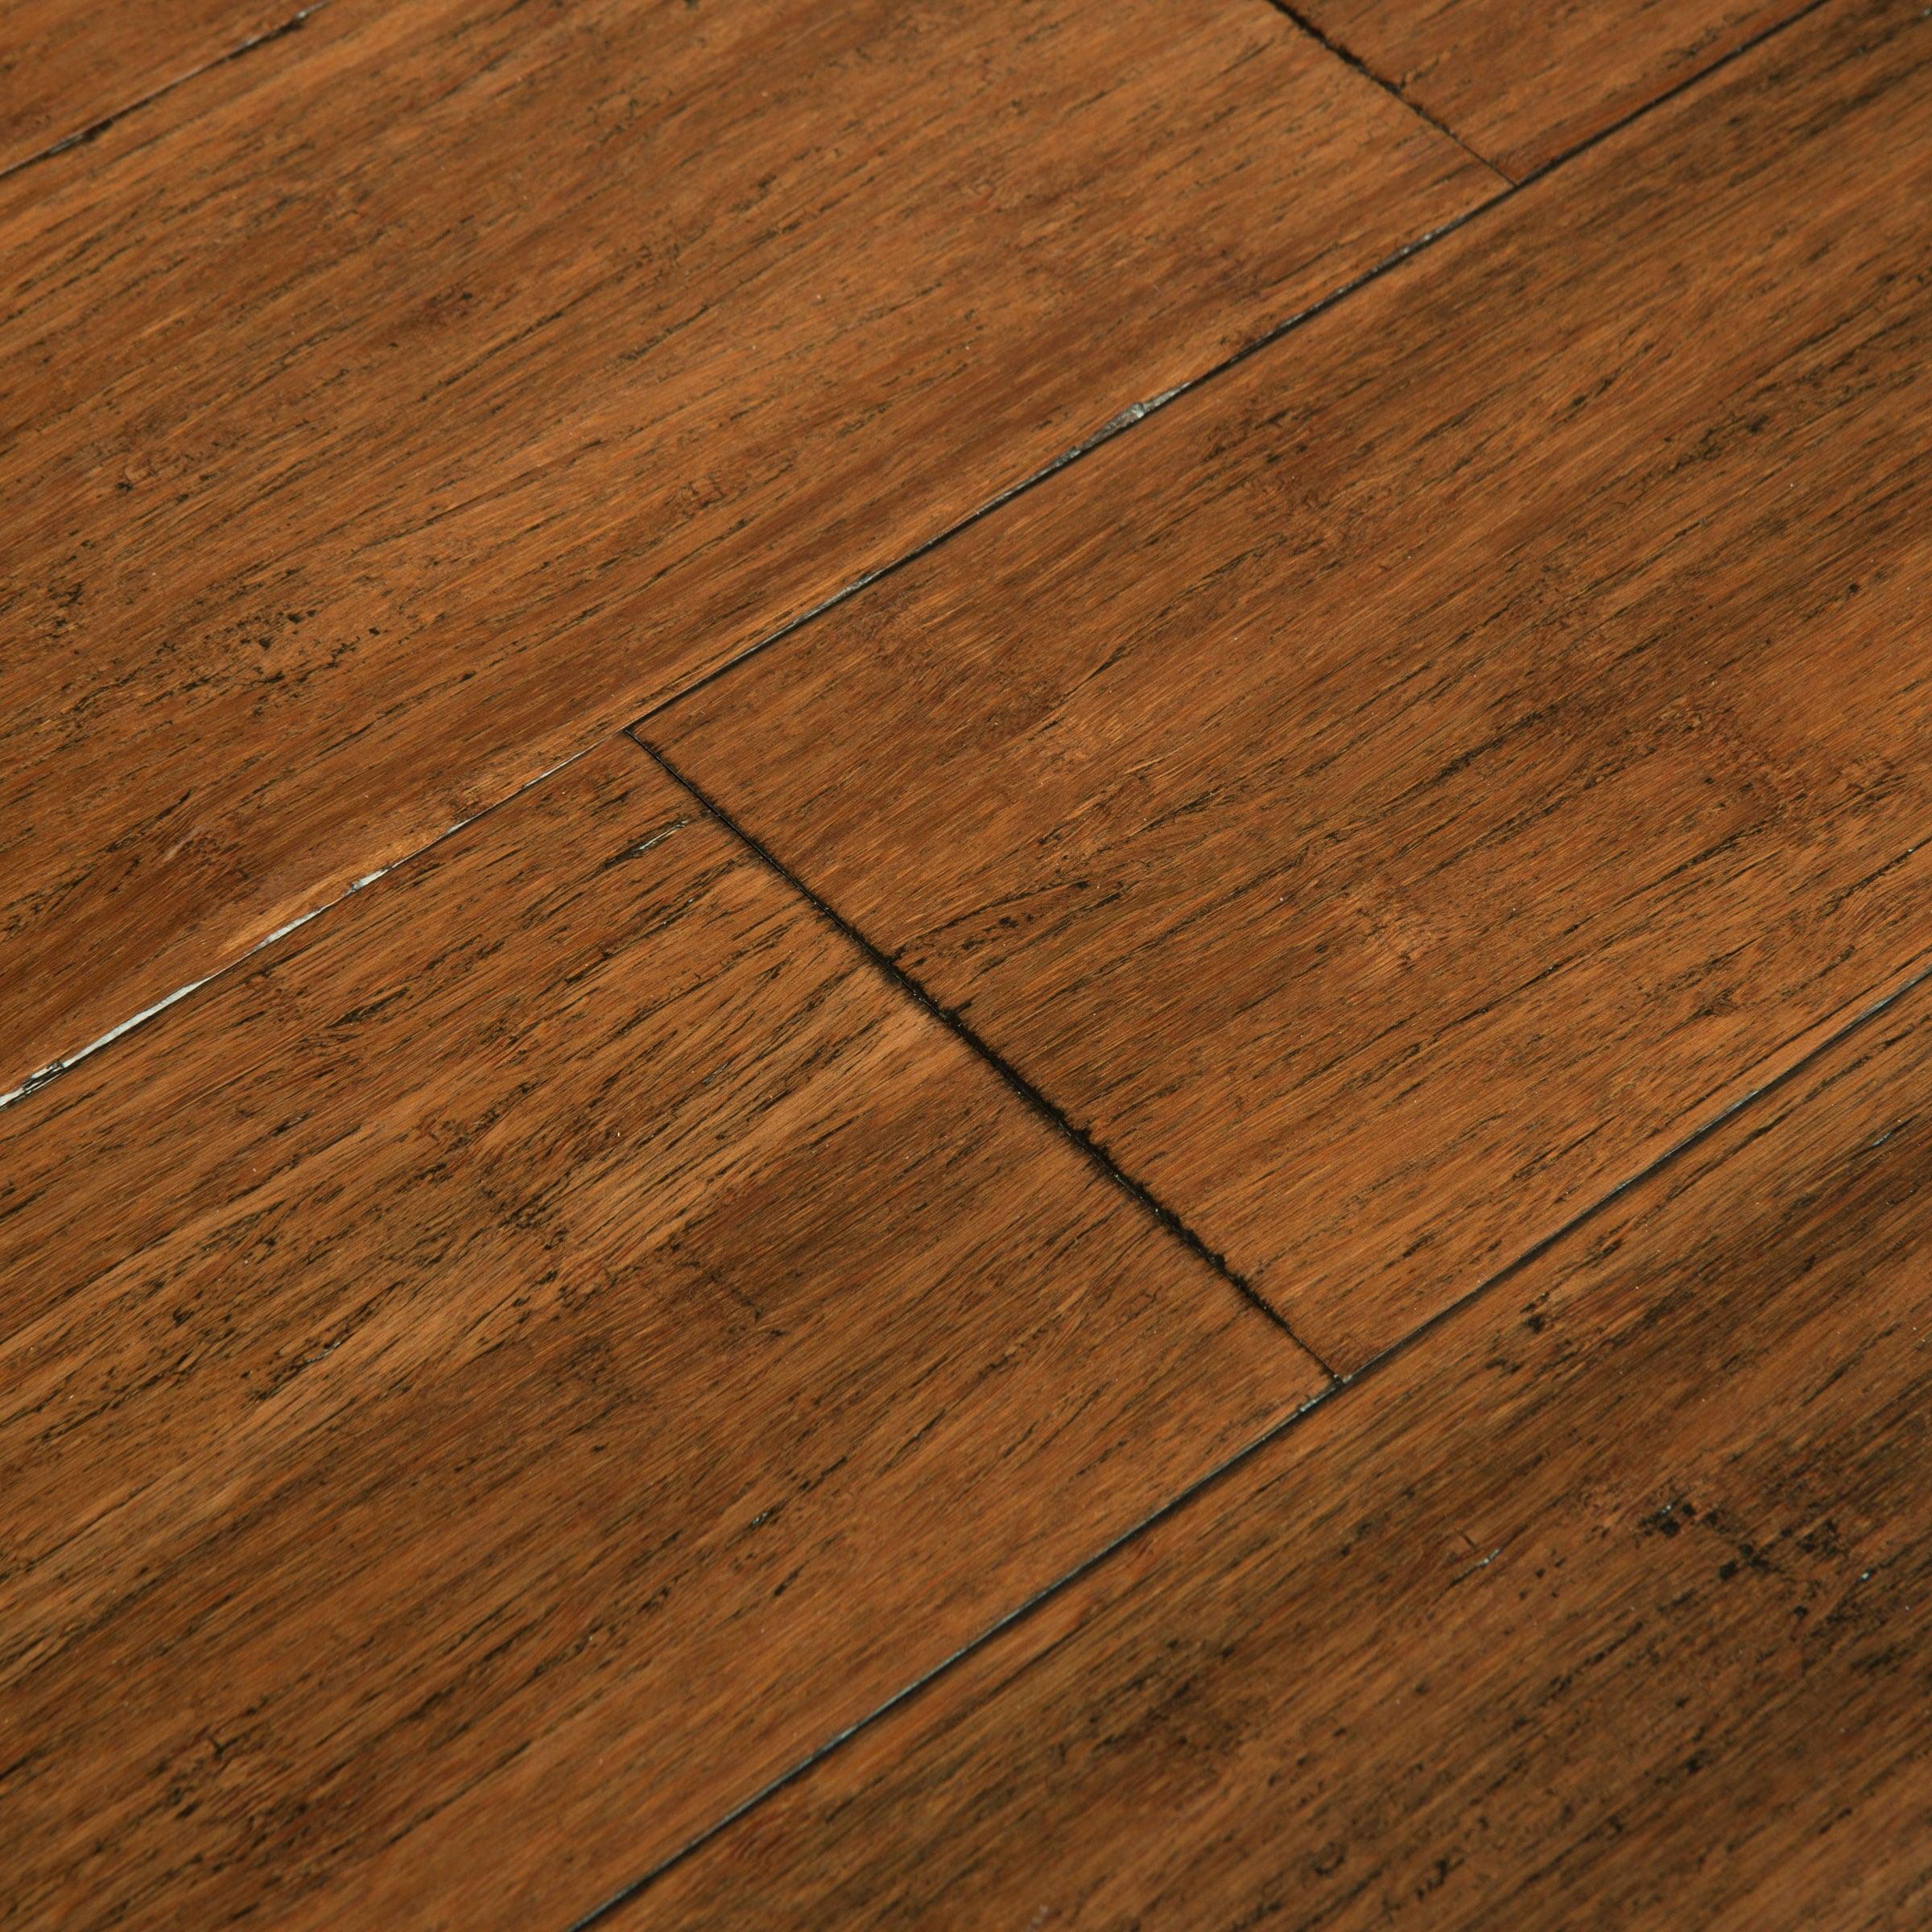 Engineered Hardwood Flooring, Waterproof Bamboo Laminate Flooring